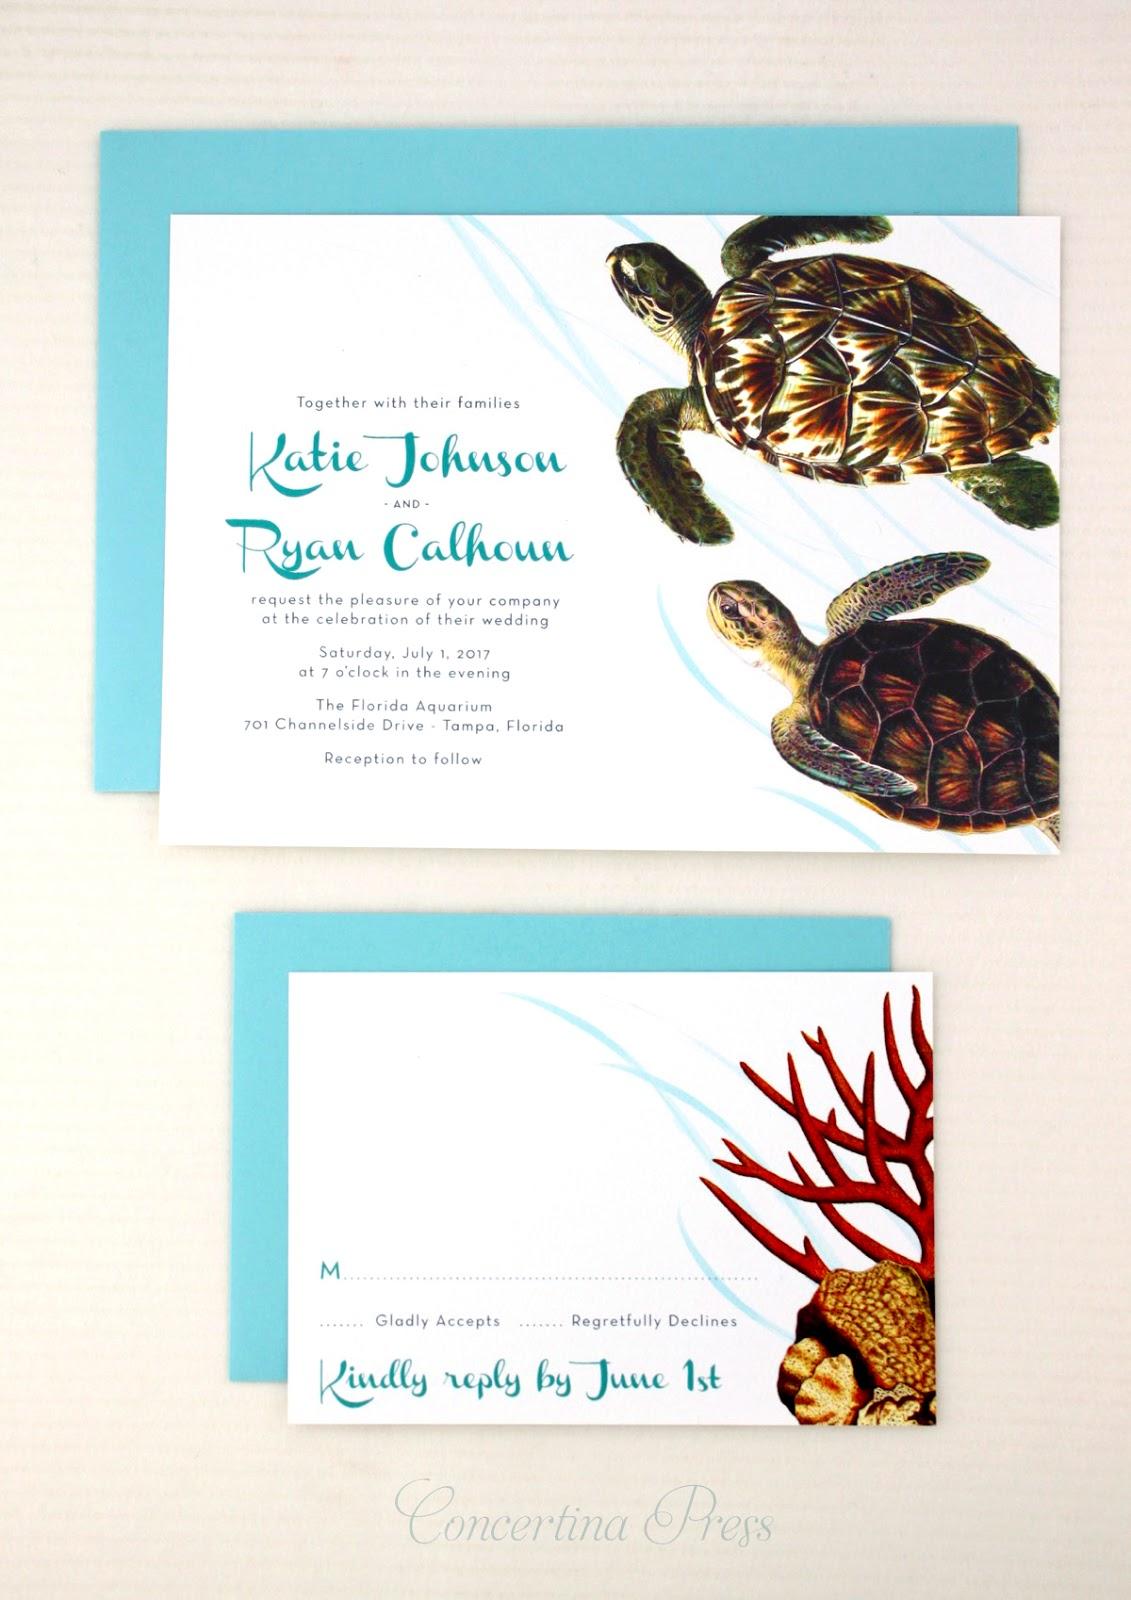 Sea Turtle Wedding Invitations for Florida Beach Wedding from Concertina Press